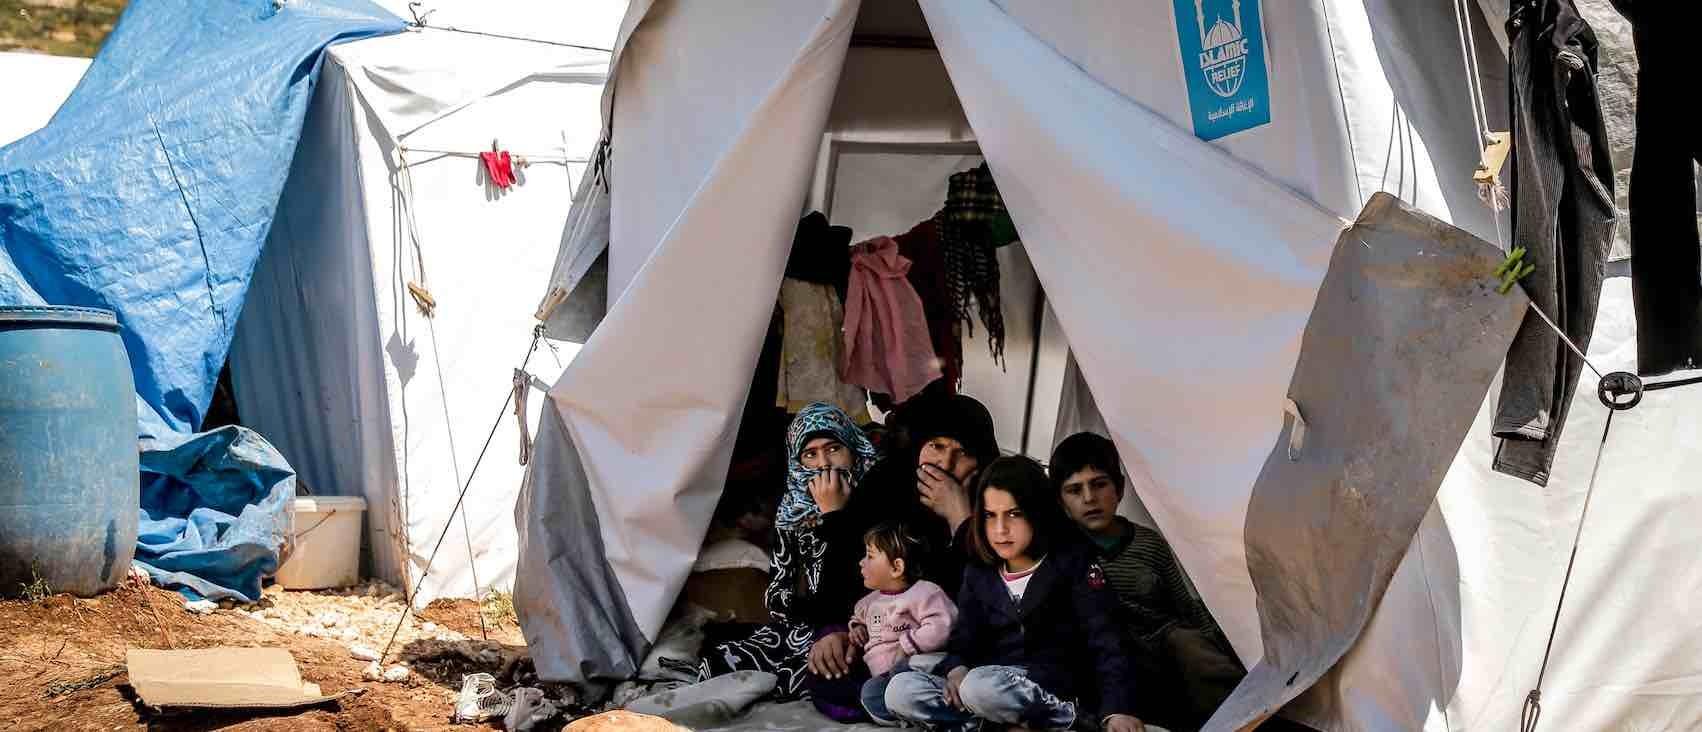 Covid refugee-camp